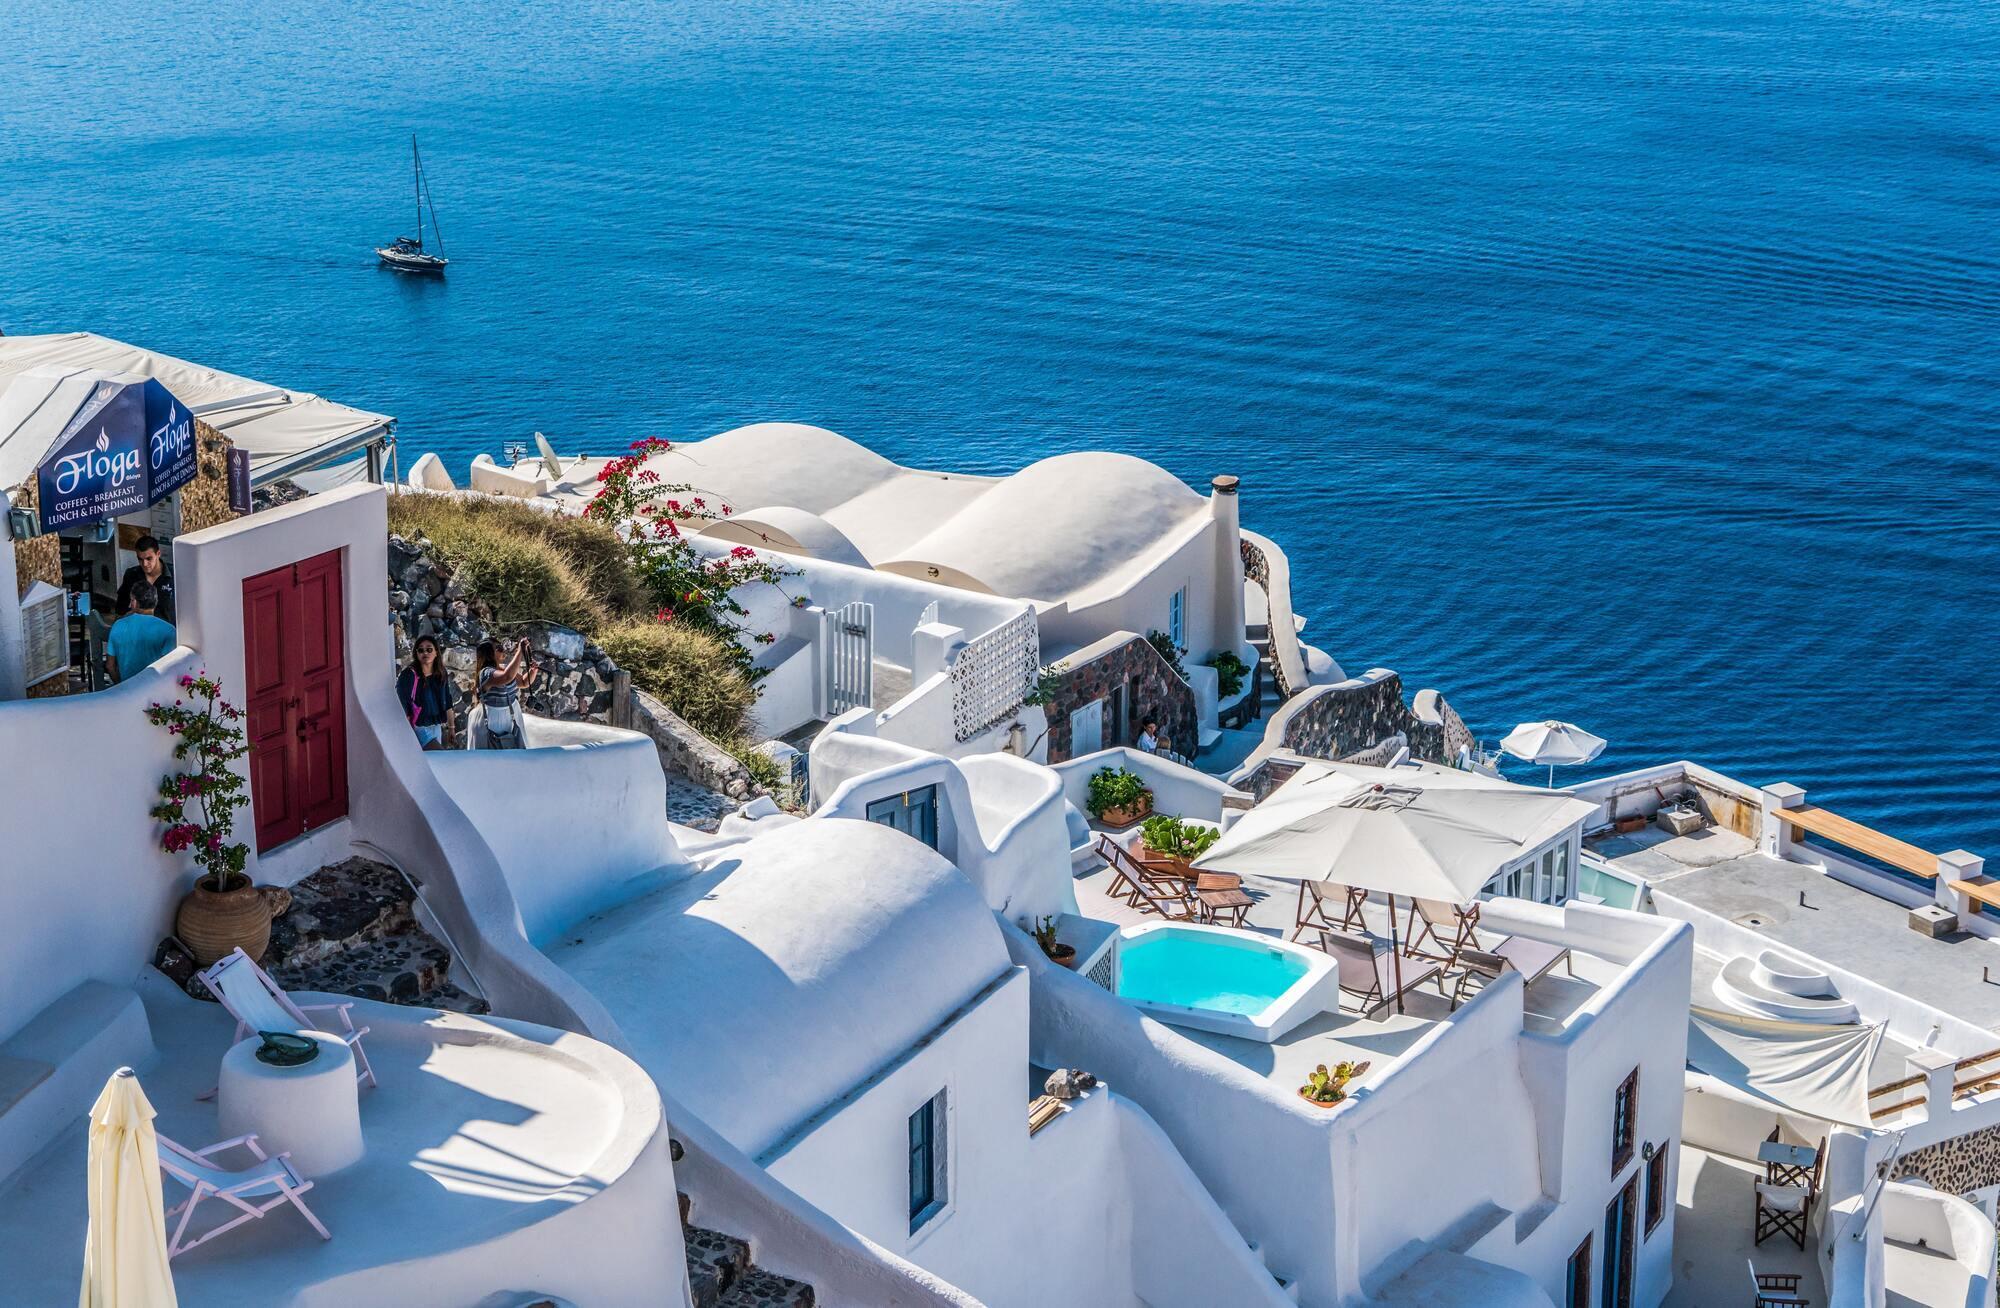 Греческий курорт Санторини знаменит бело-синими домиками